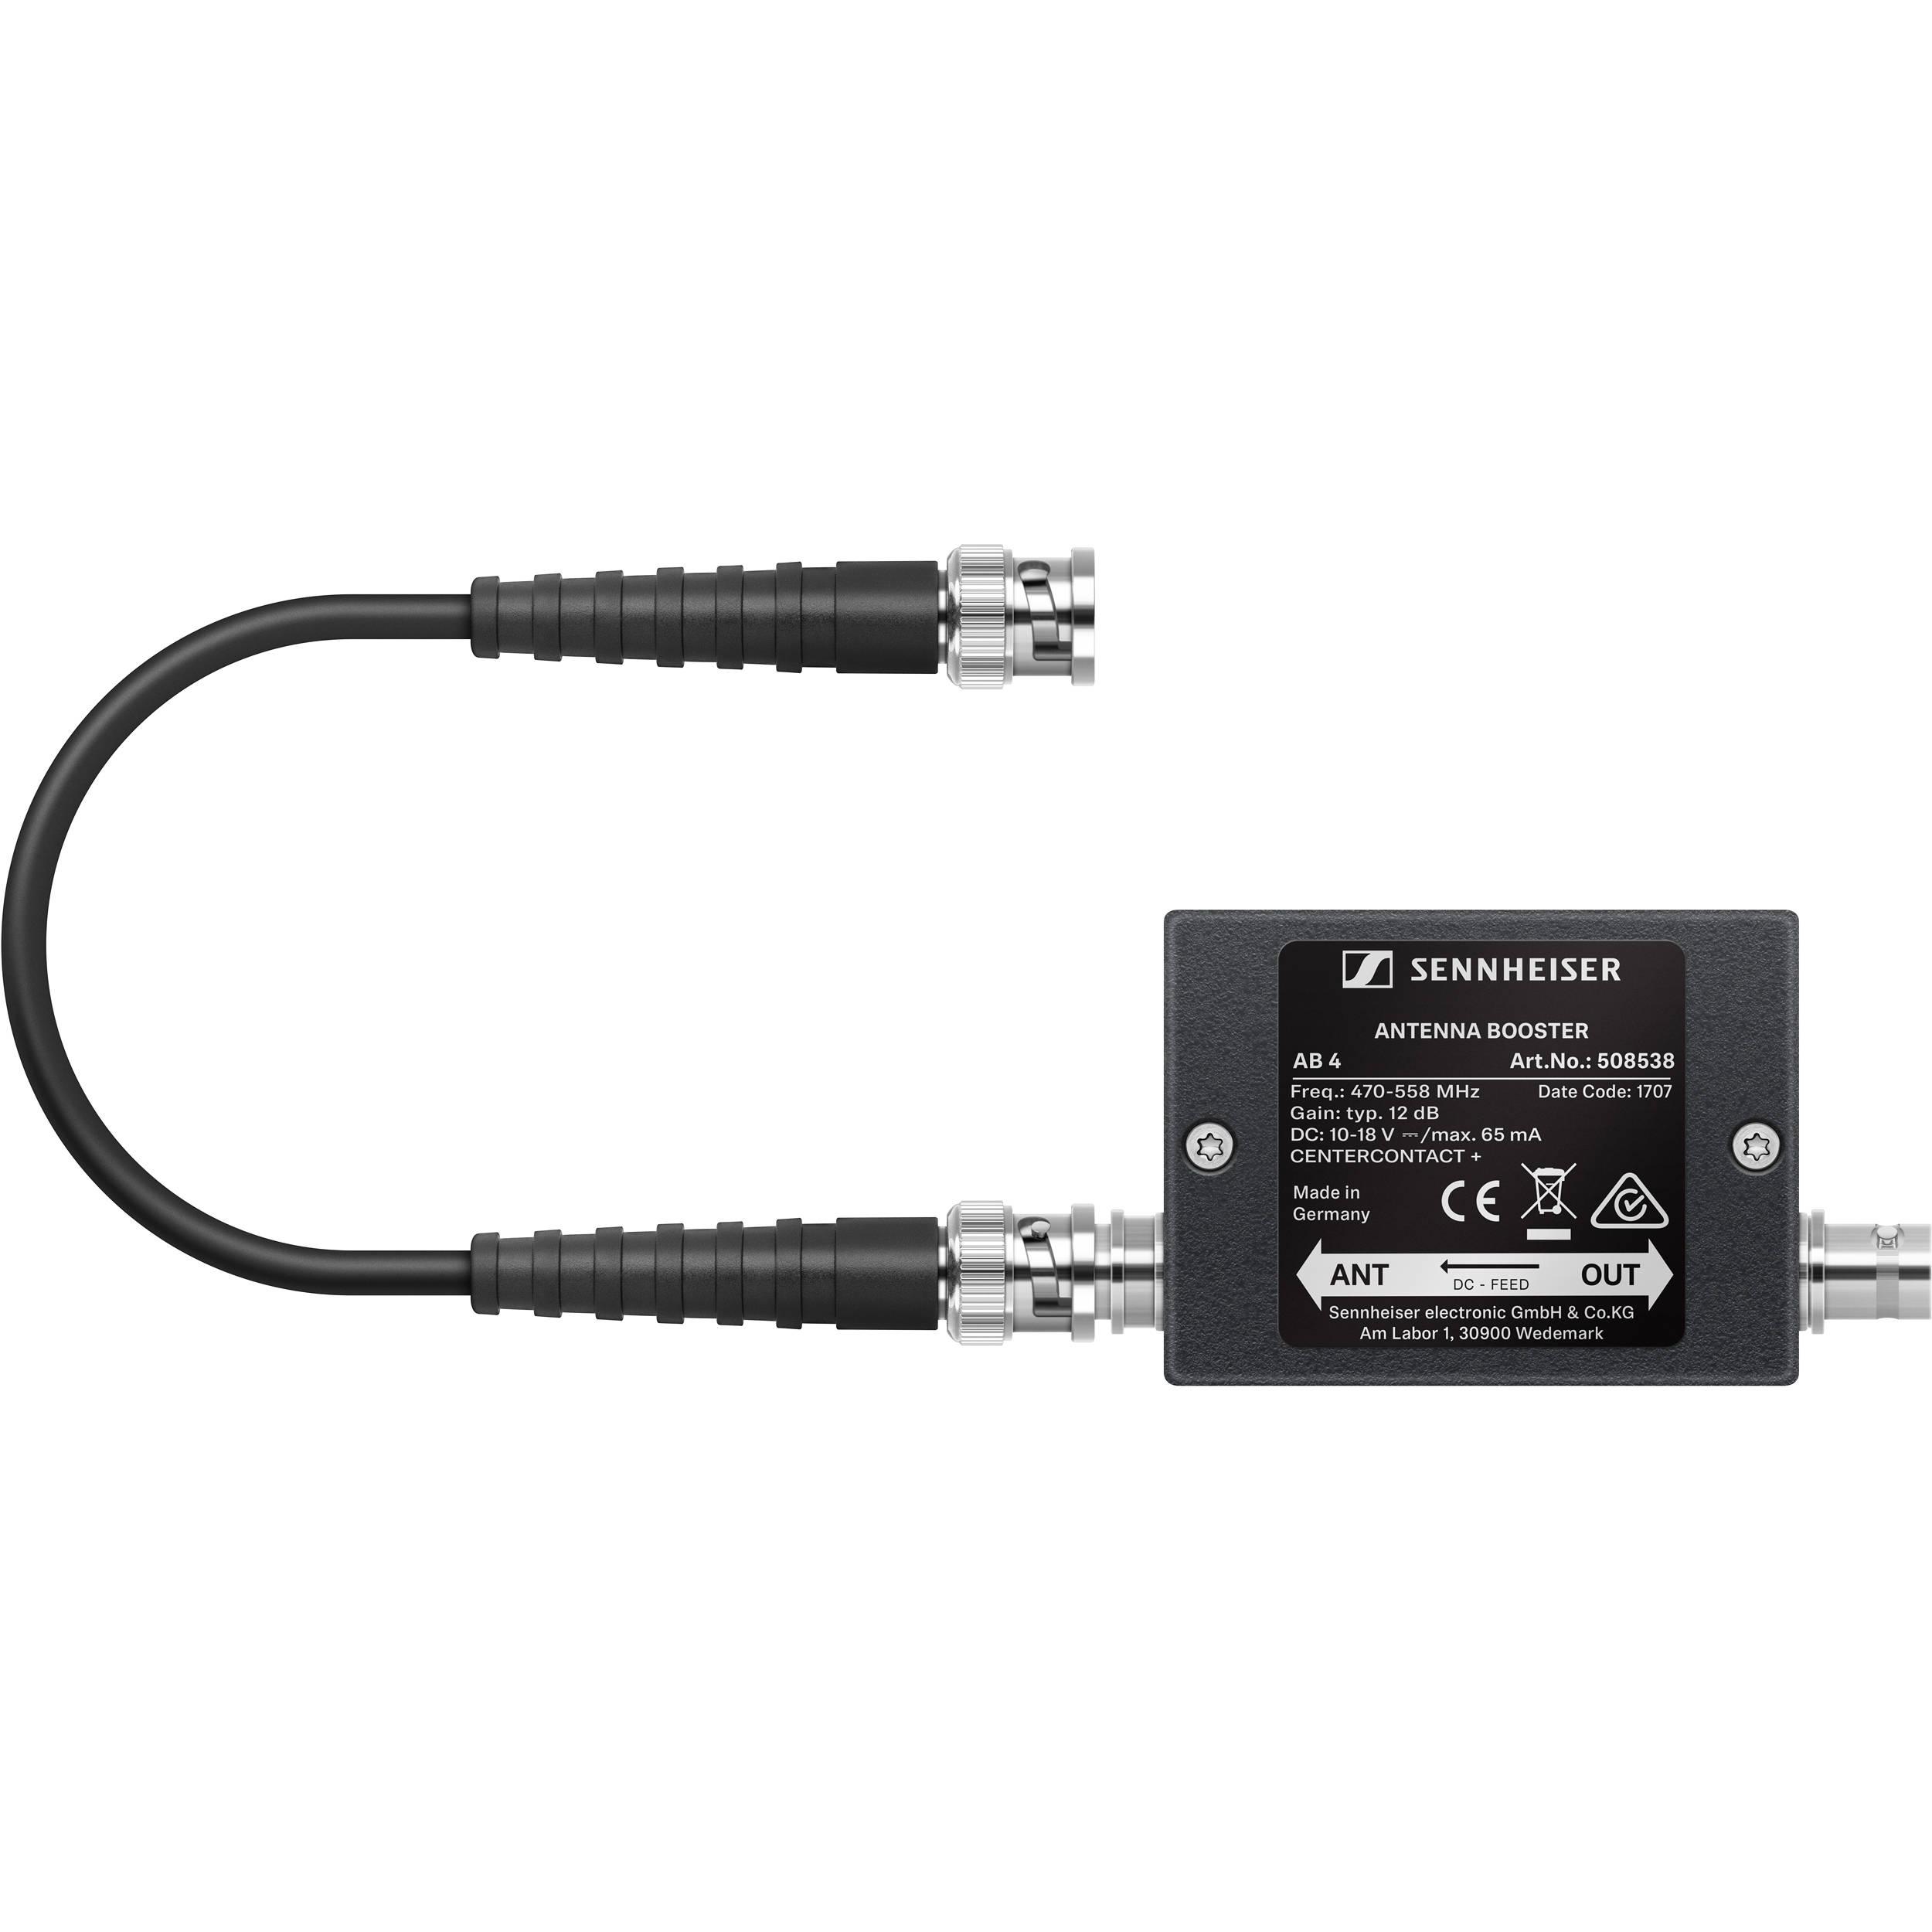 65cd5f6c2780fa Sennheiser AB 4-AW+ Antenna Booster (470 to 558 MHz) AB 4-AW+